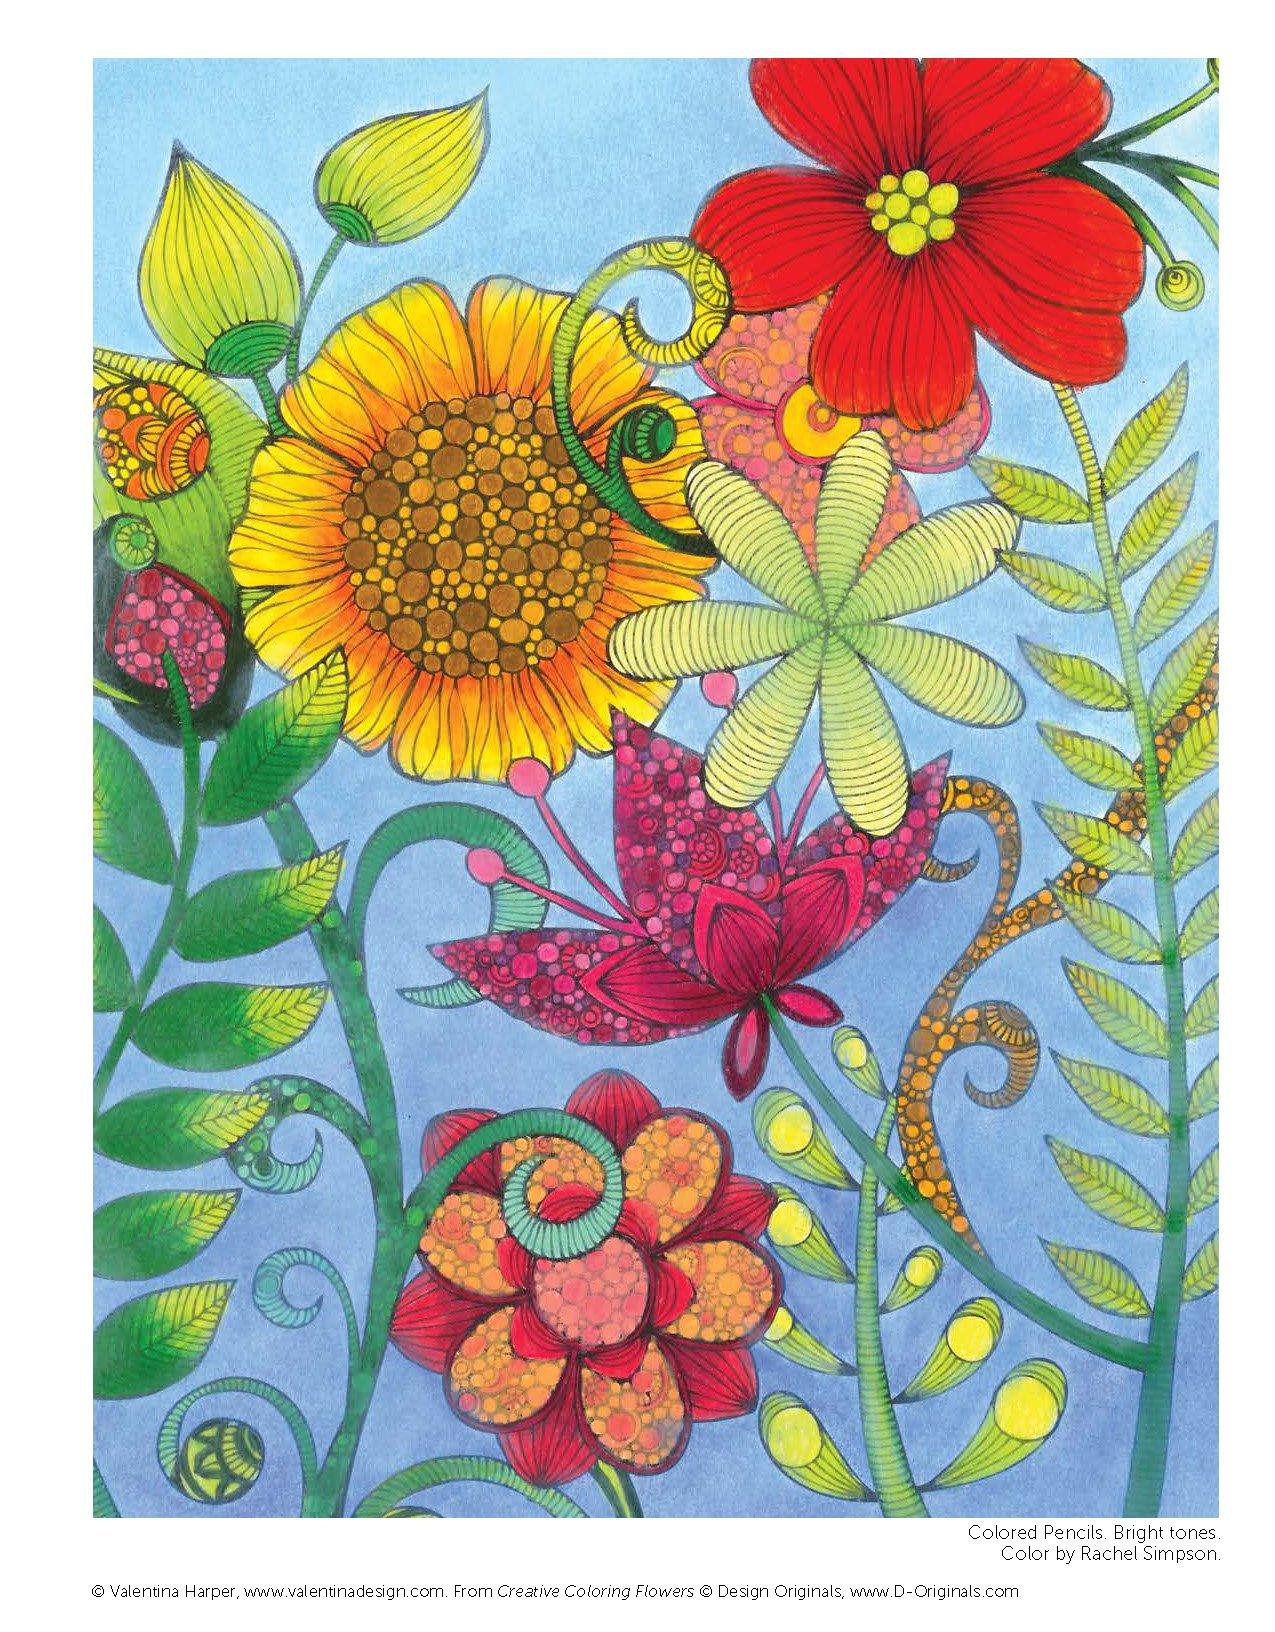 Creative Coloring Flowers: Amazon.de: Valentina Harper ...